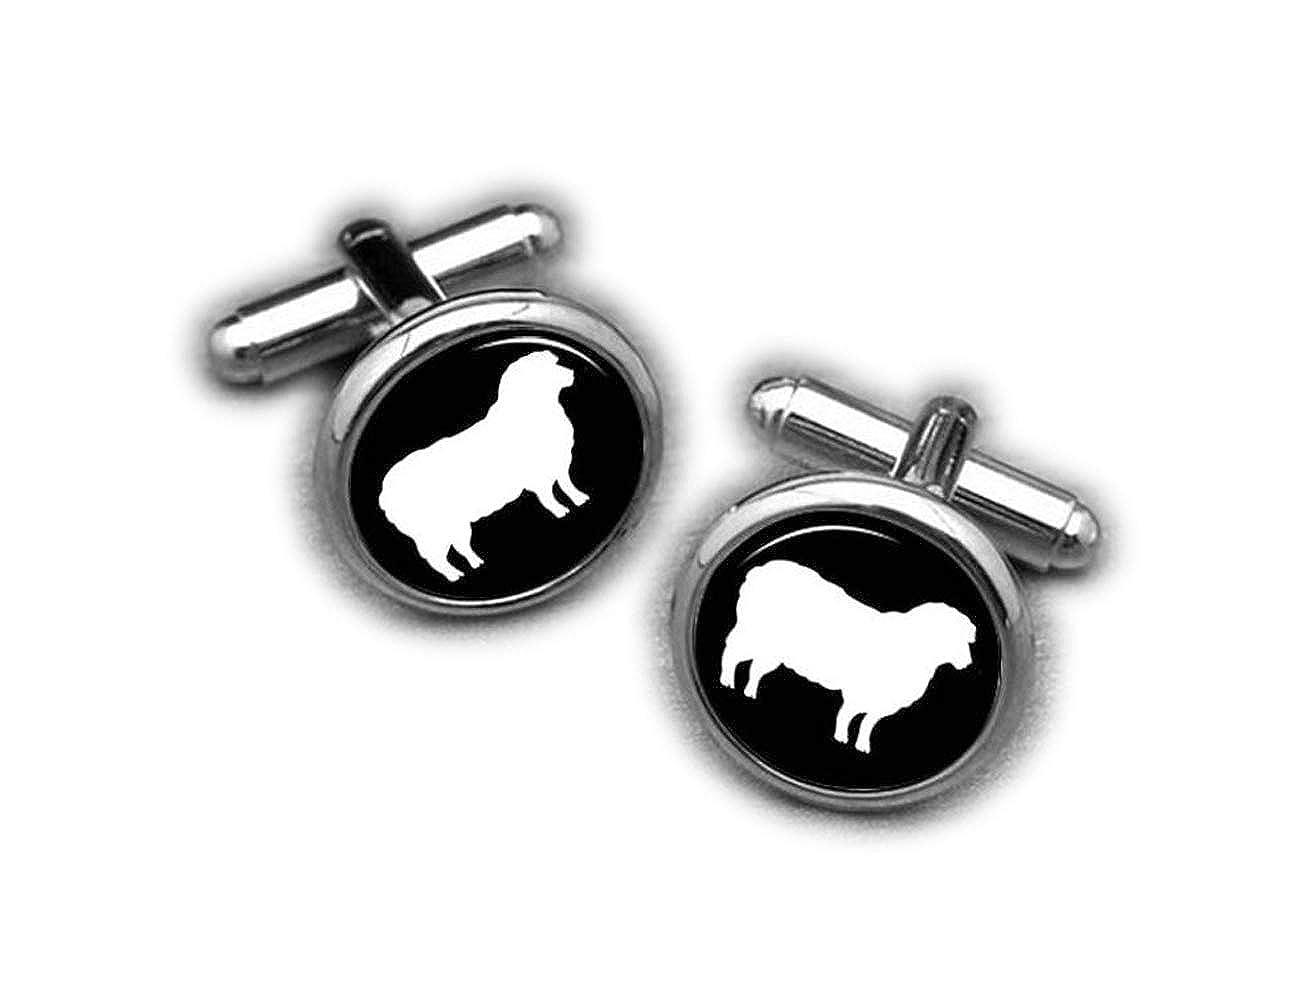 chen jian xin Gemelos de oveja plata personalizados para granjeros ...